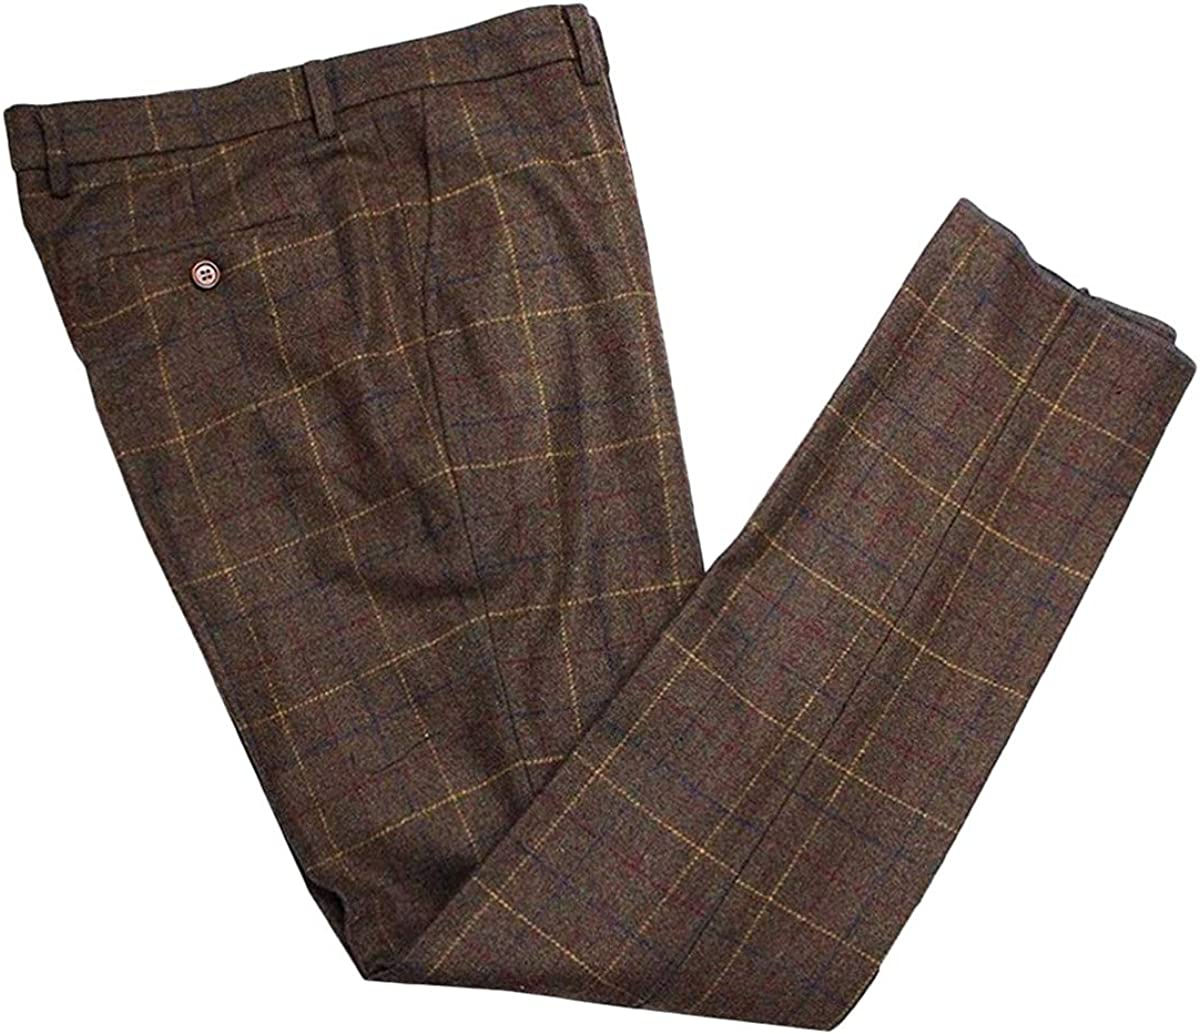 Wemaliyzd Men's Premiun Tweed Blend Check Max 56% OFF Dress Flat Front Overseas parallel import regular item Pants